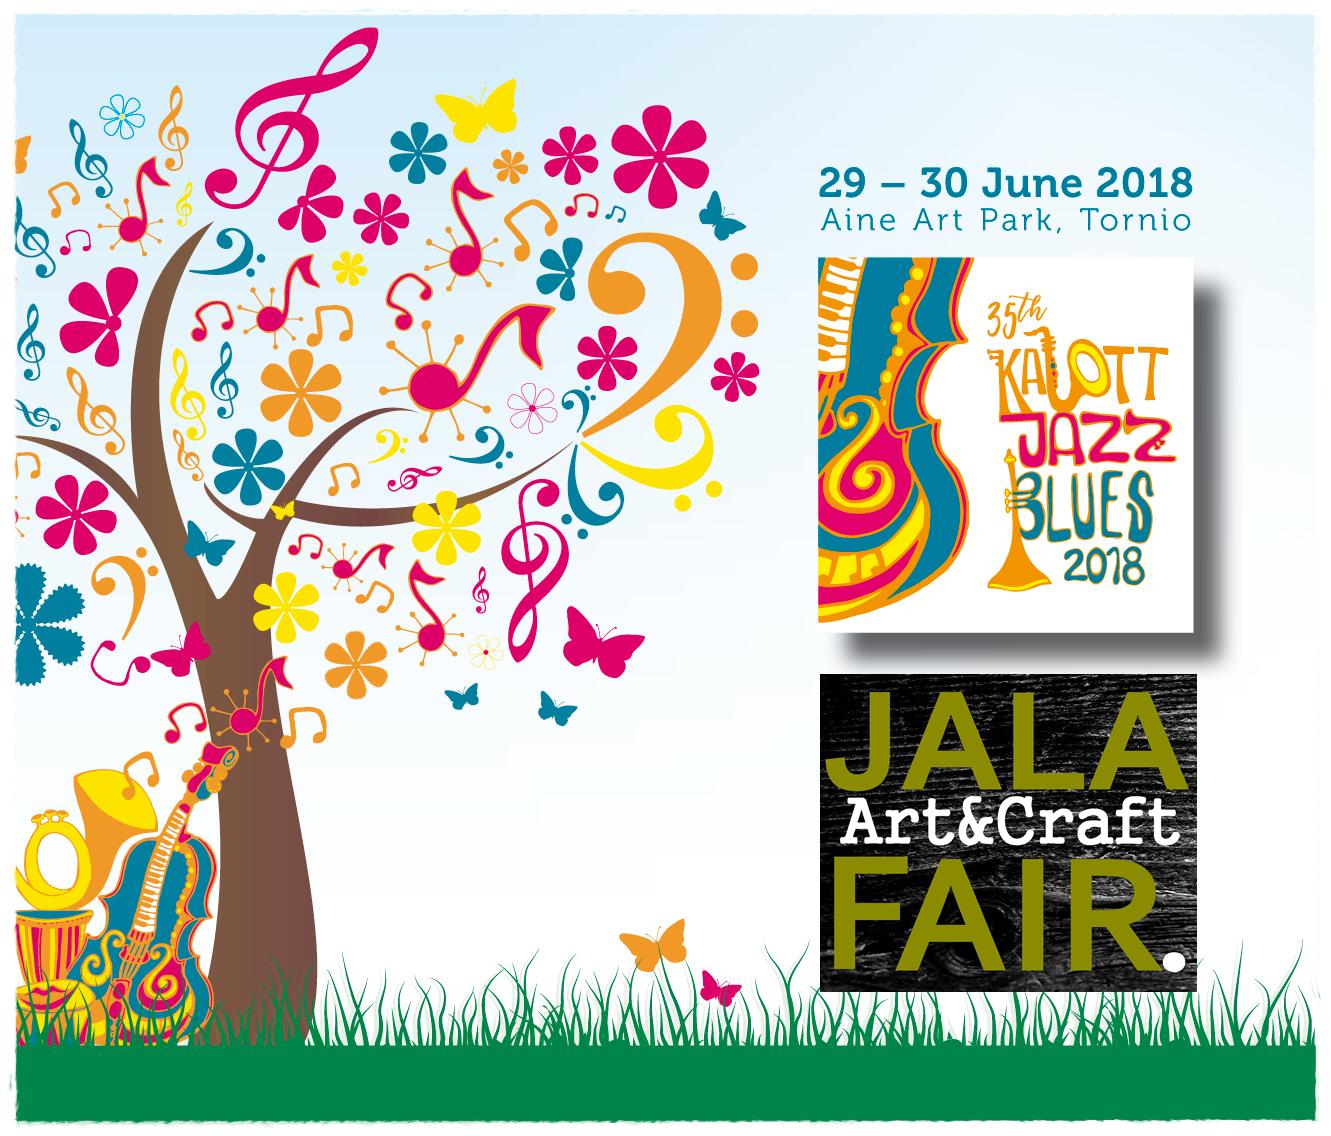 Jala Art & Craft Fair goes Kalottjazz & Blues!